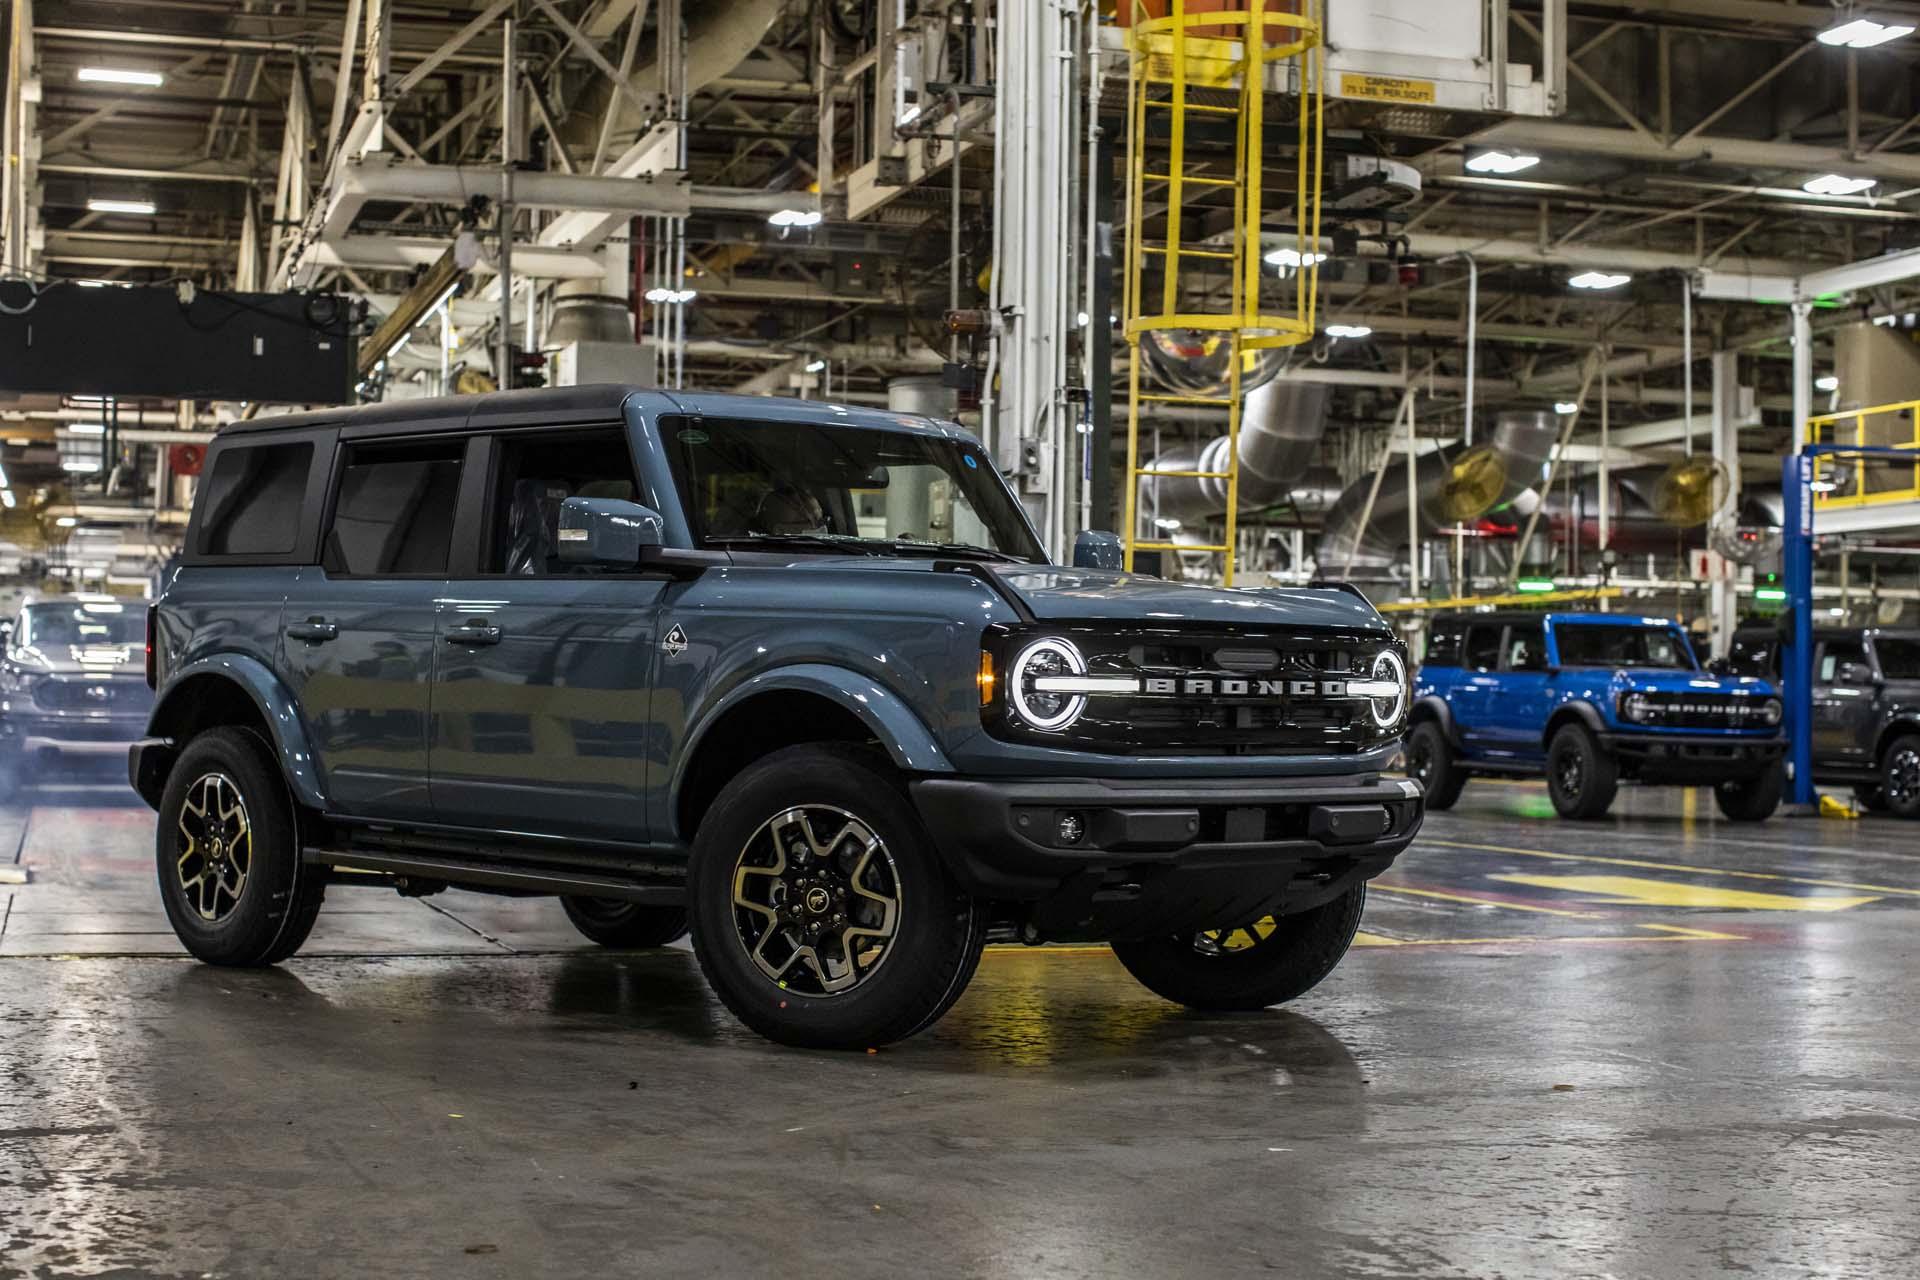 2022 Porsche Macan, 2022 Toyota Tundra, 2021 Ford Bronco: Car News Headlines